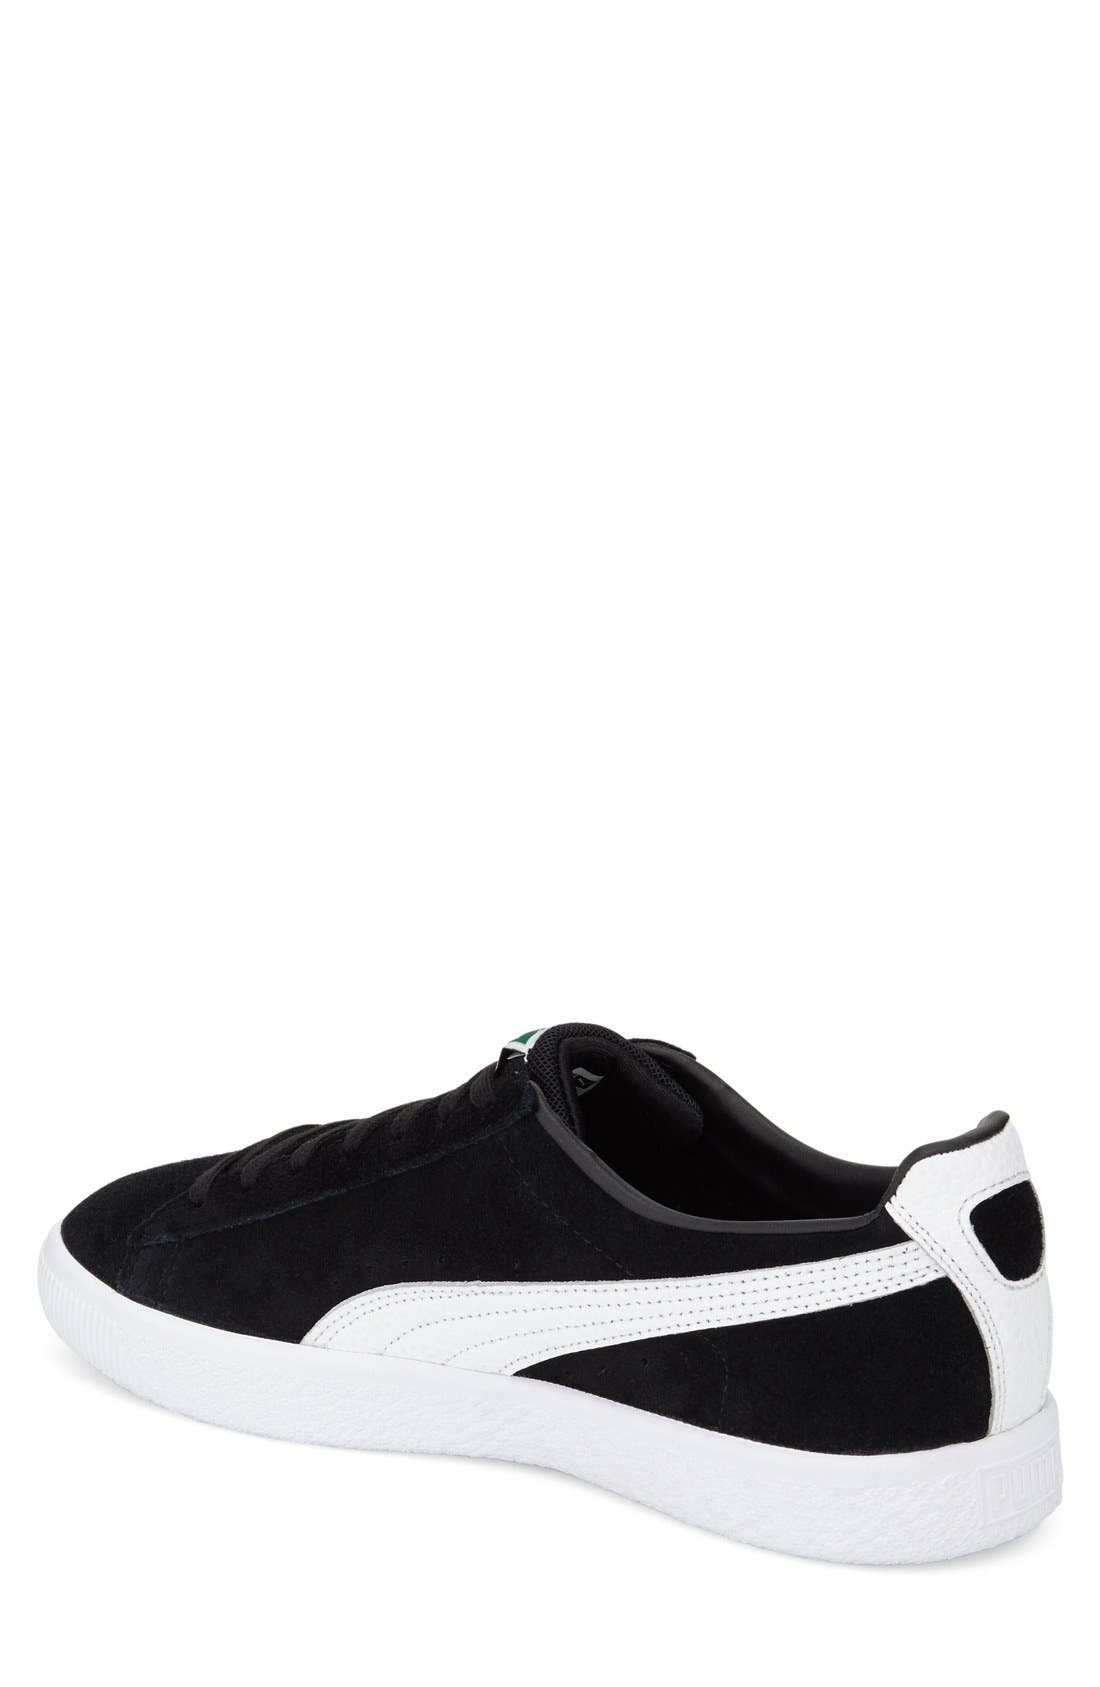 'Clyde B&C' Sneaker,                             Alternate thumbnail 2, color,                             001